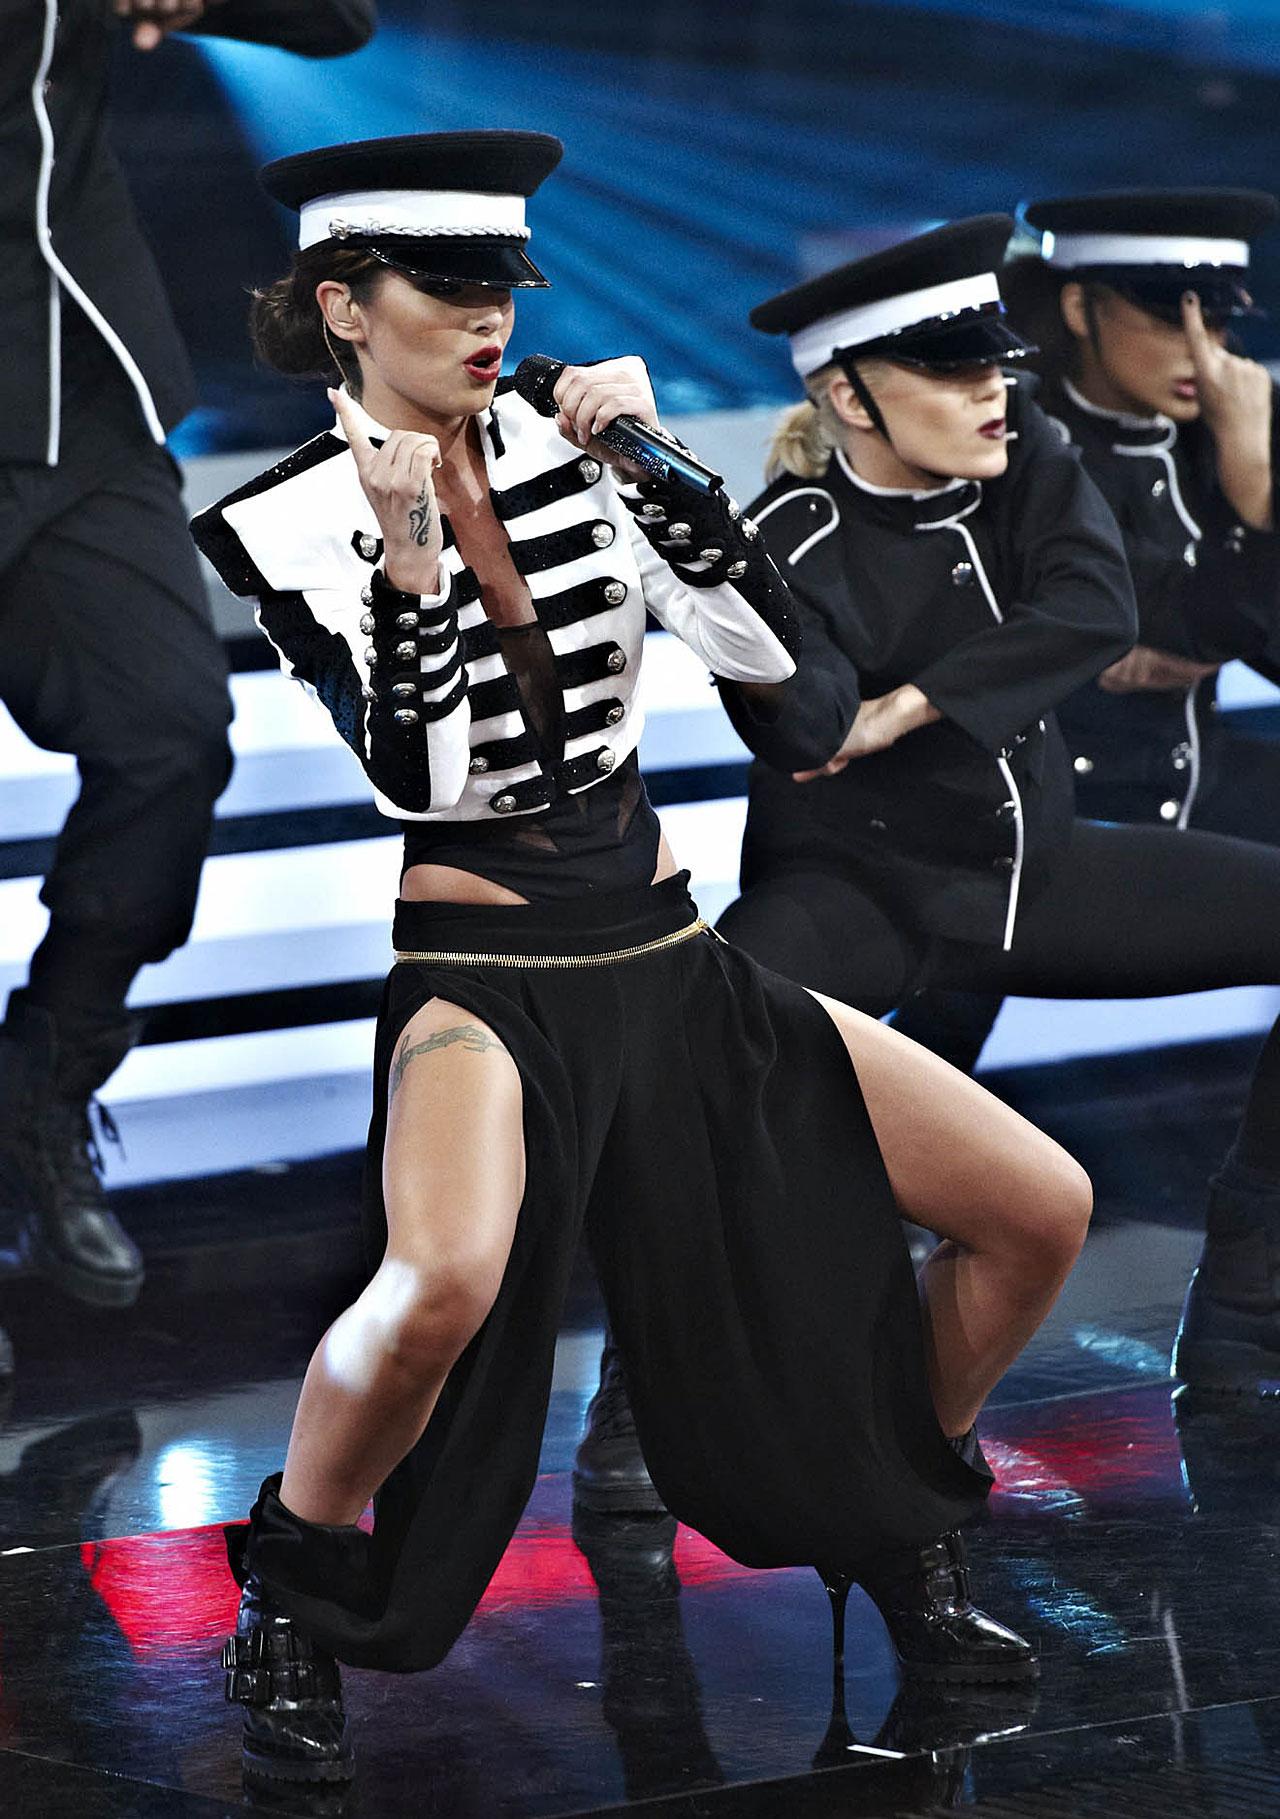 Cheryl cole fashion police 76